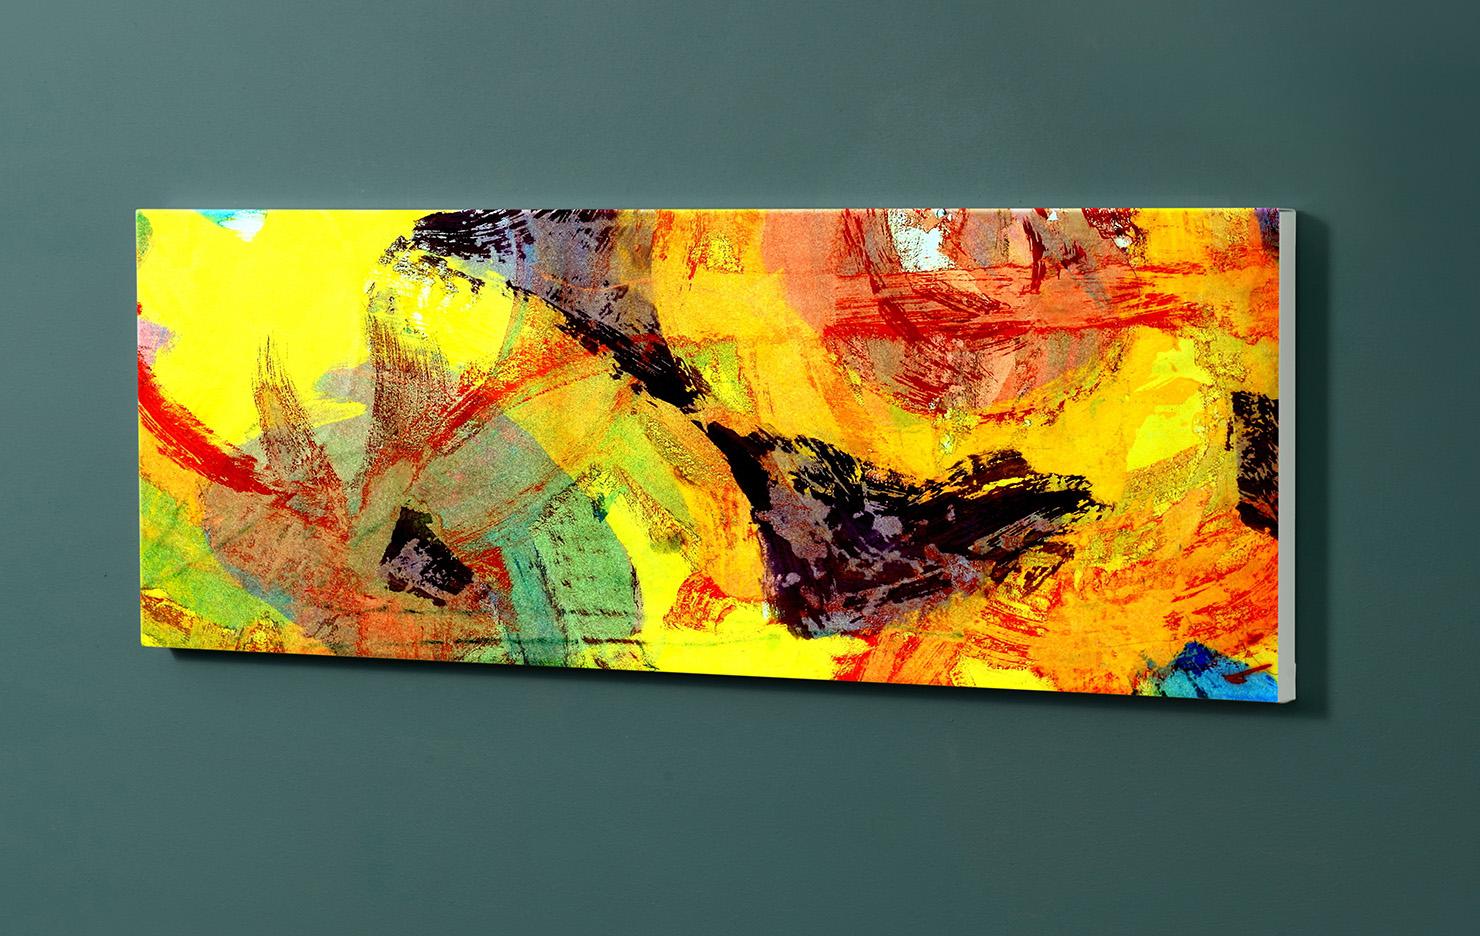 Magnettafel NOTIZ 90x30cm Motiv-Pinnwand M09 Abstrakt Kunst